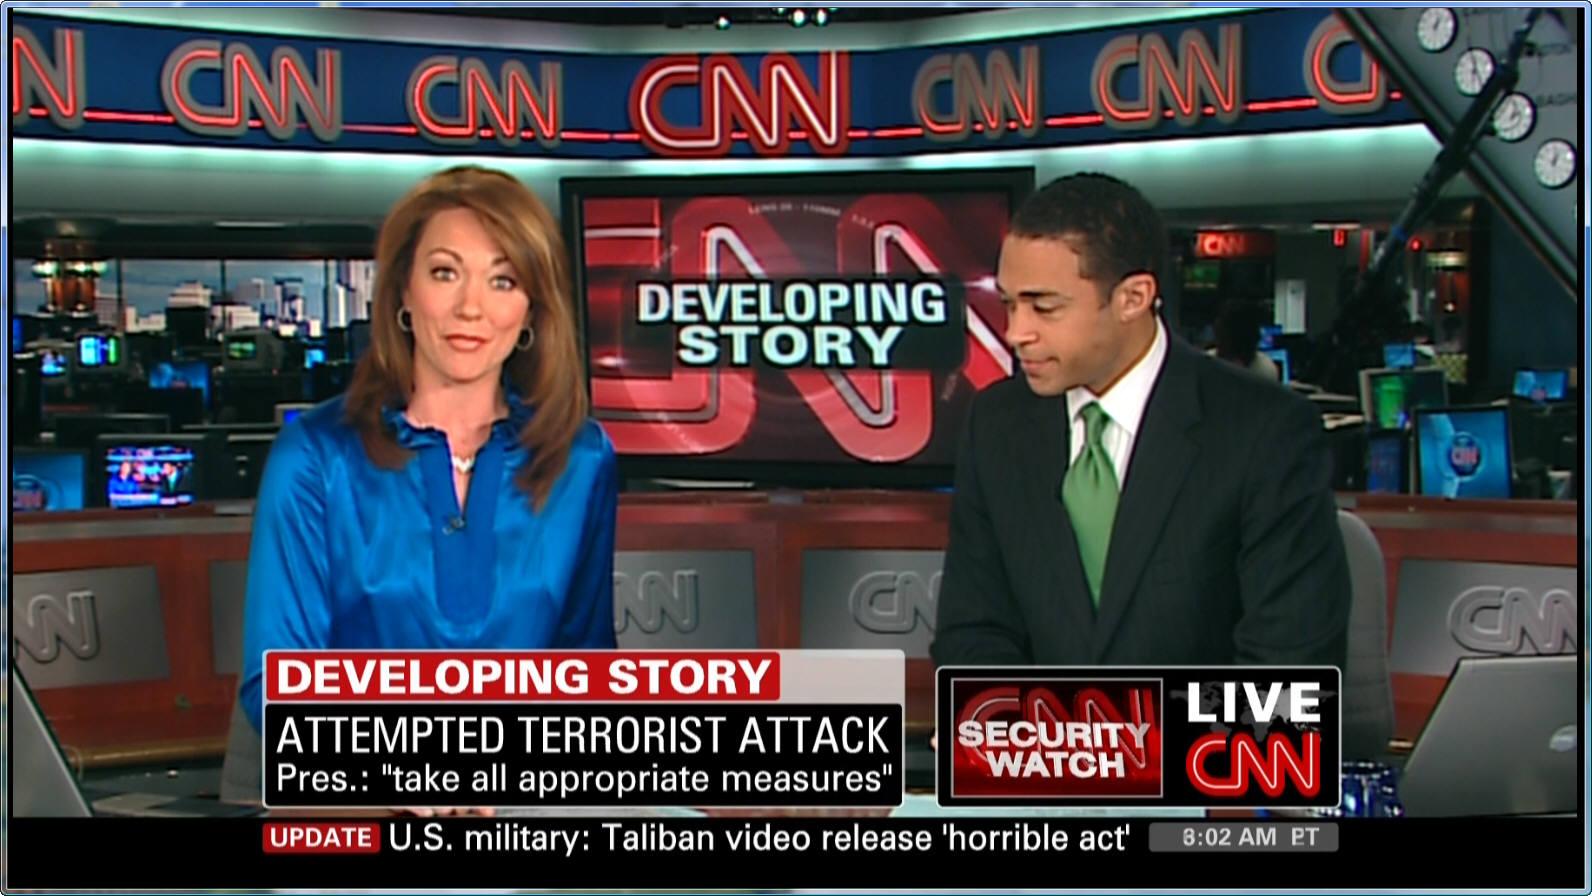 video news cnn - HD1592×896